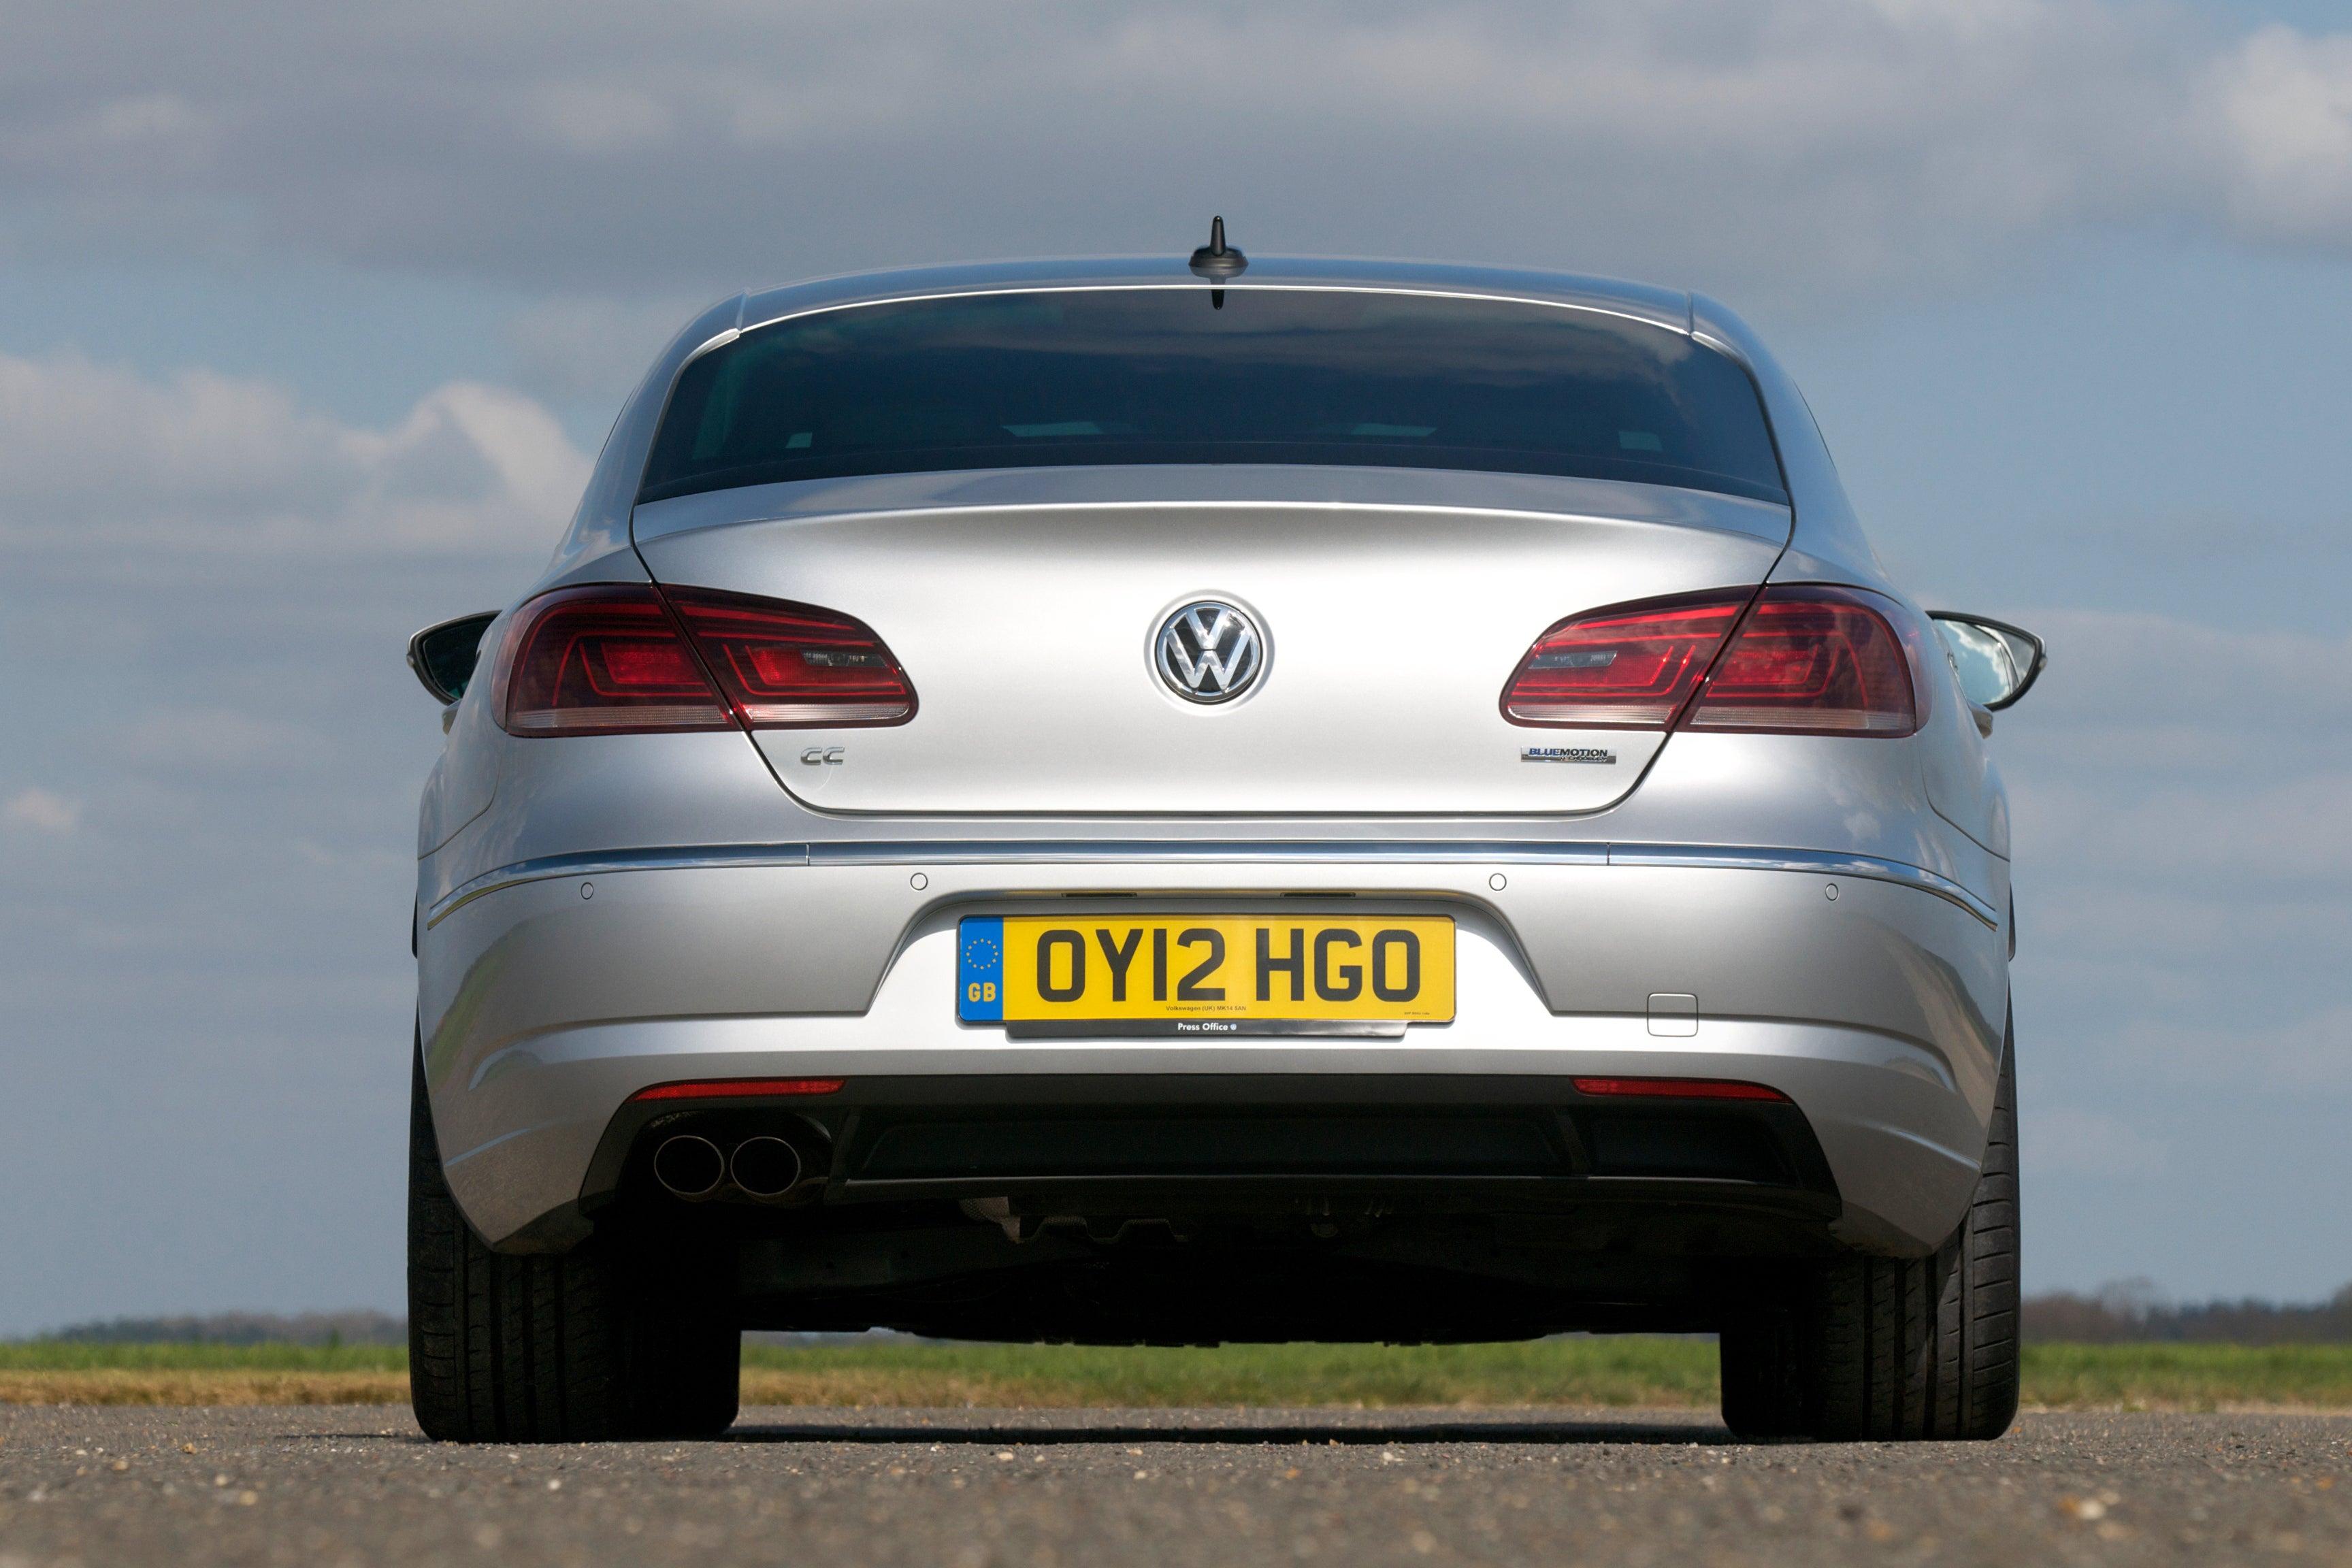 Volkswagen CC Rear View